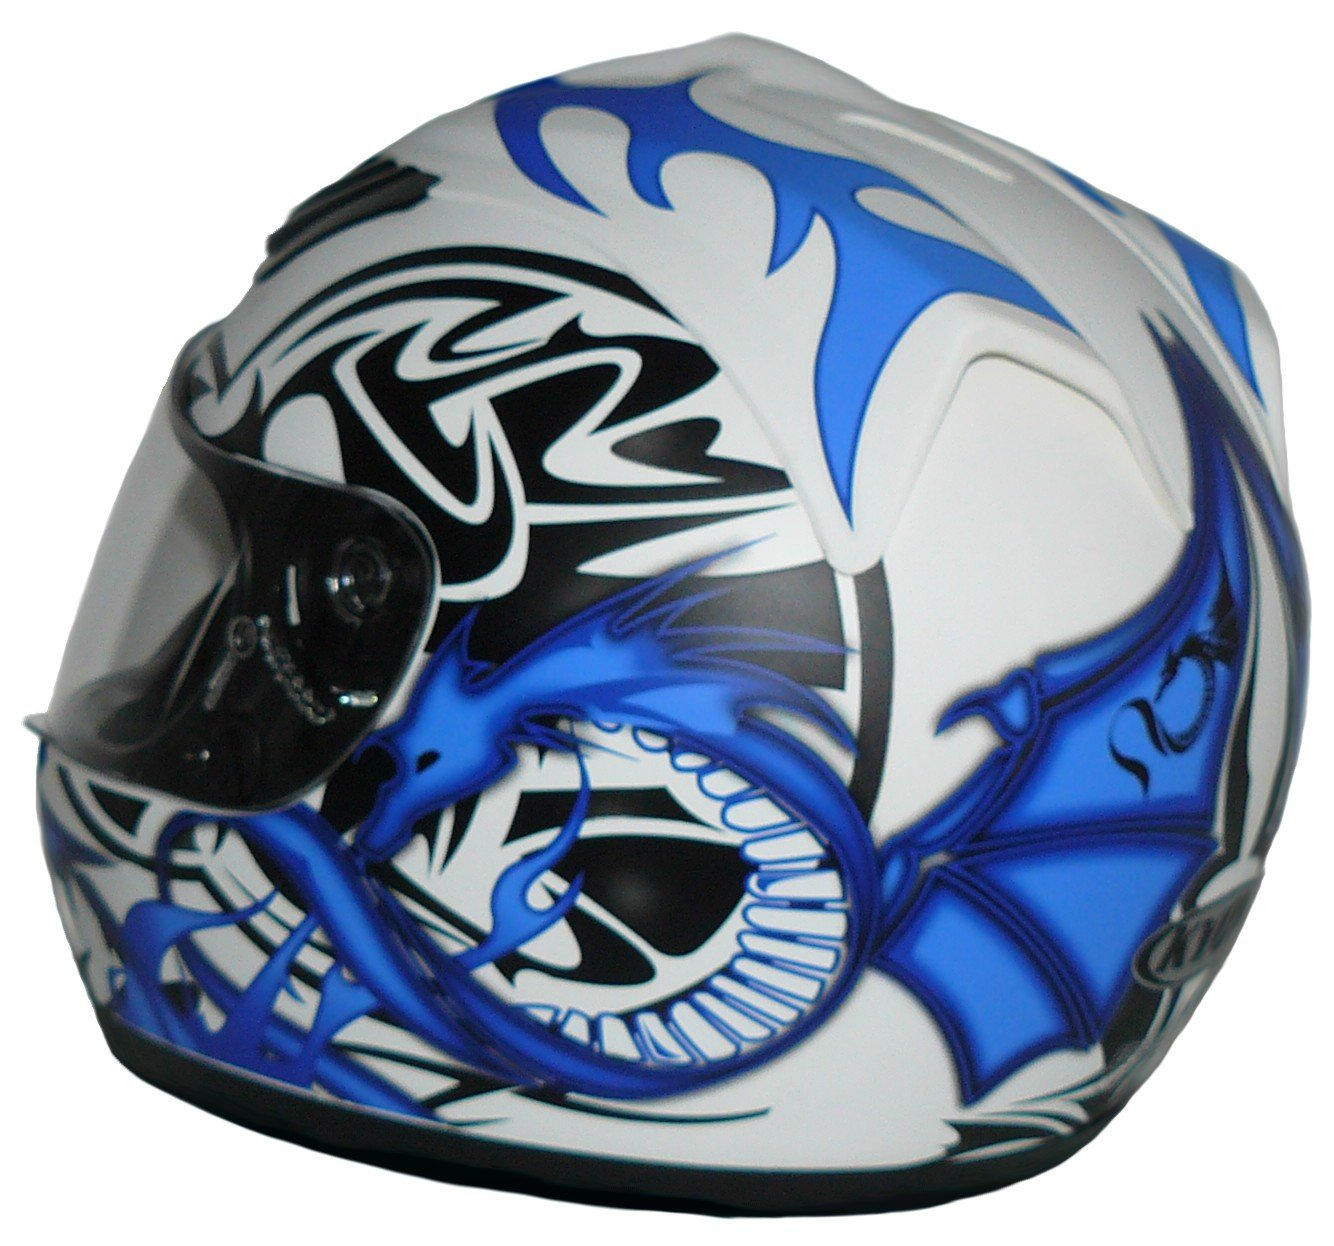 Protectwear Motorcycle helmet matt black H-510-ES Size M